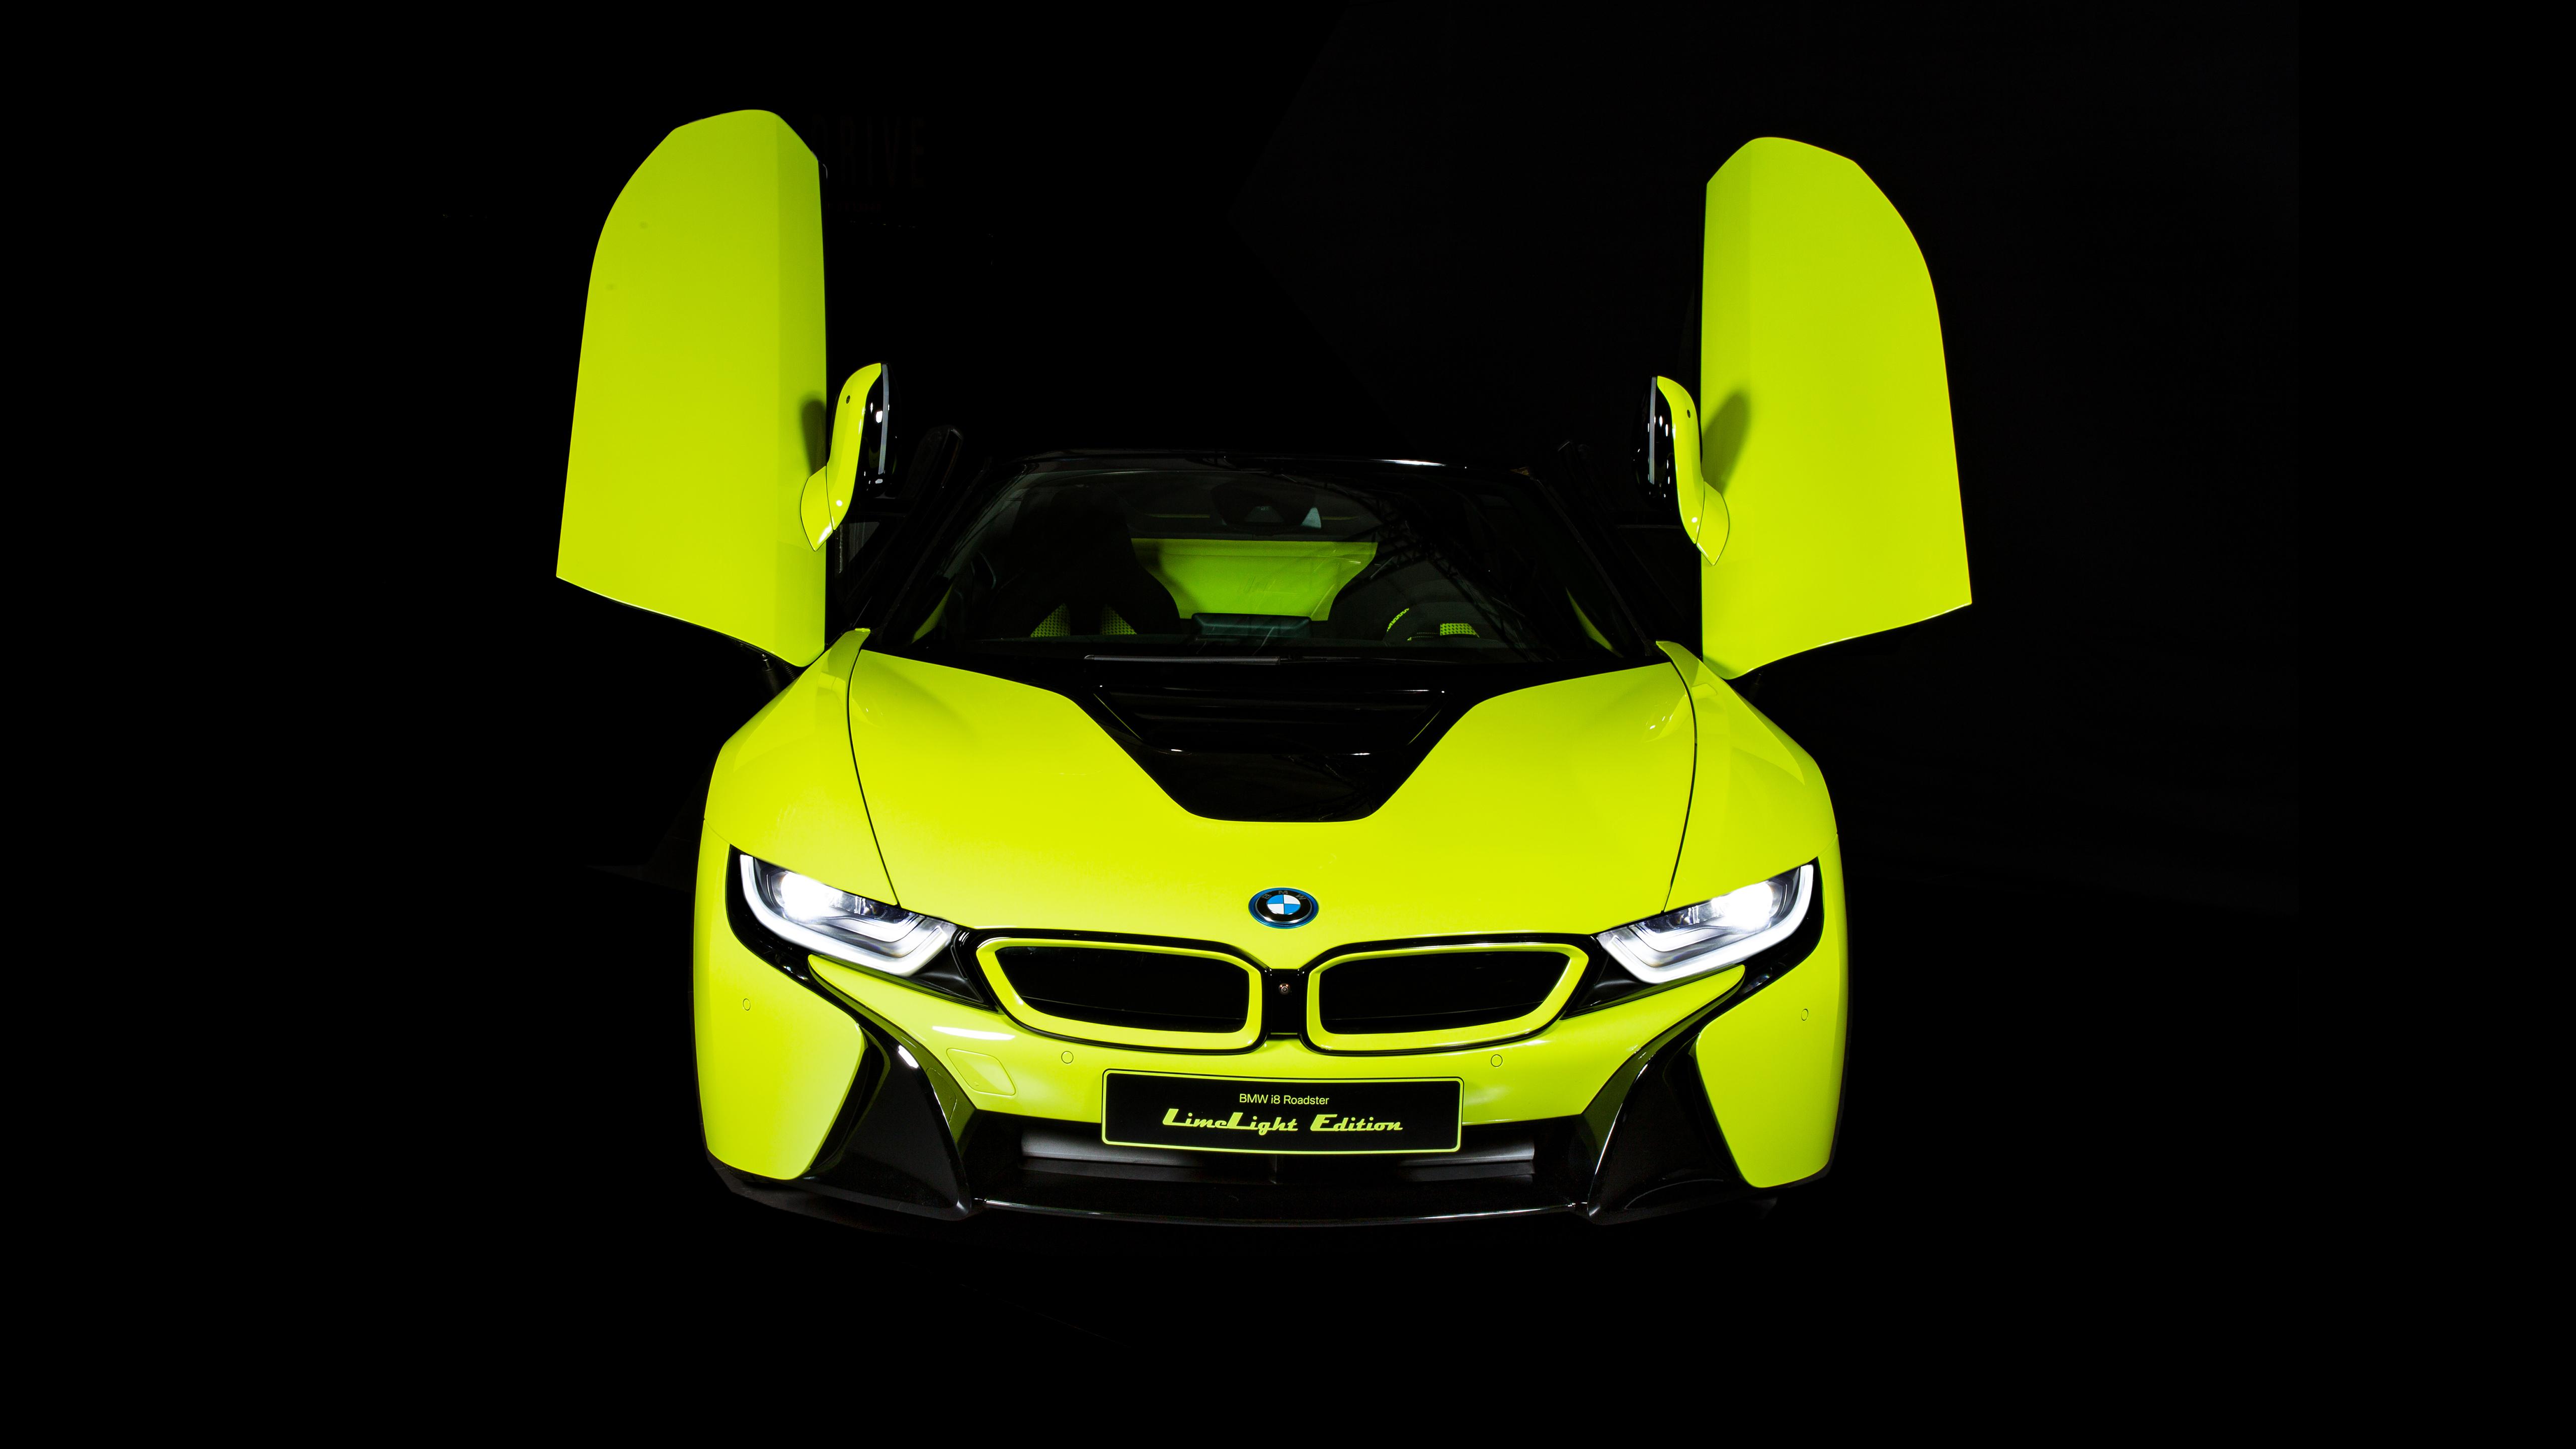 BMW i8 Roadster LimeLight Edition 2019 4K Wallpaper | HD ...